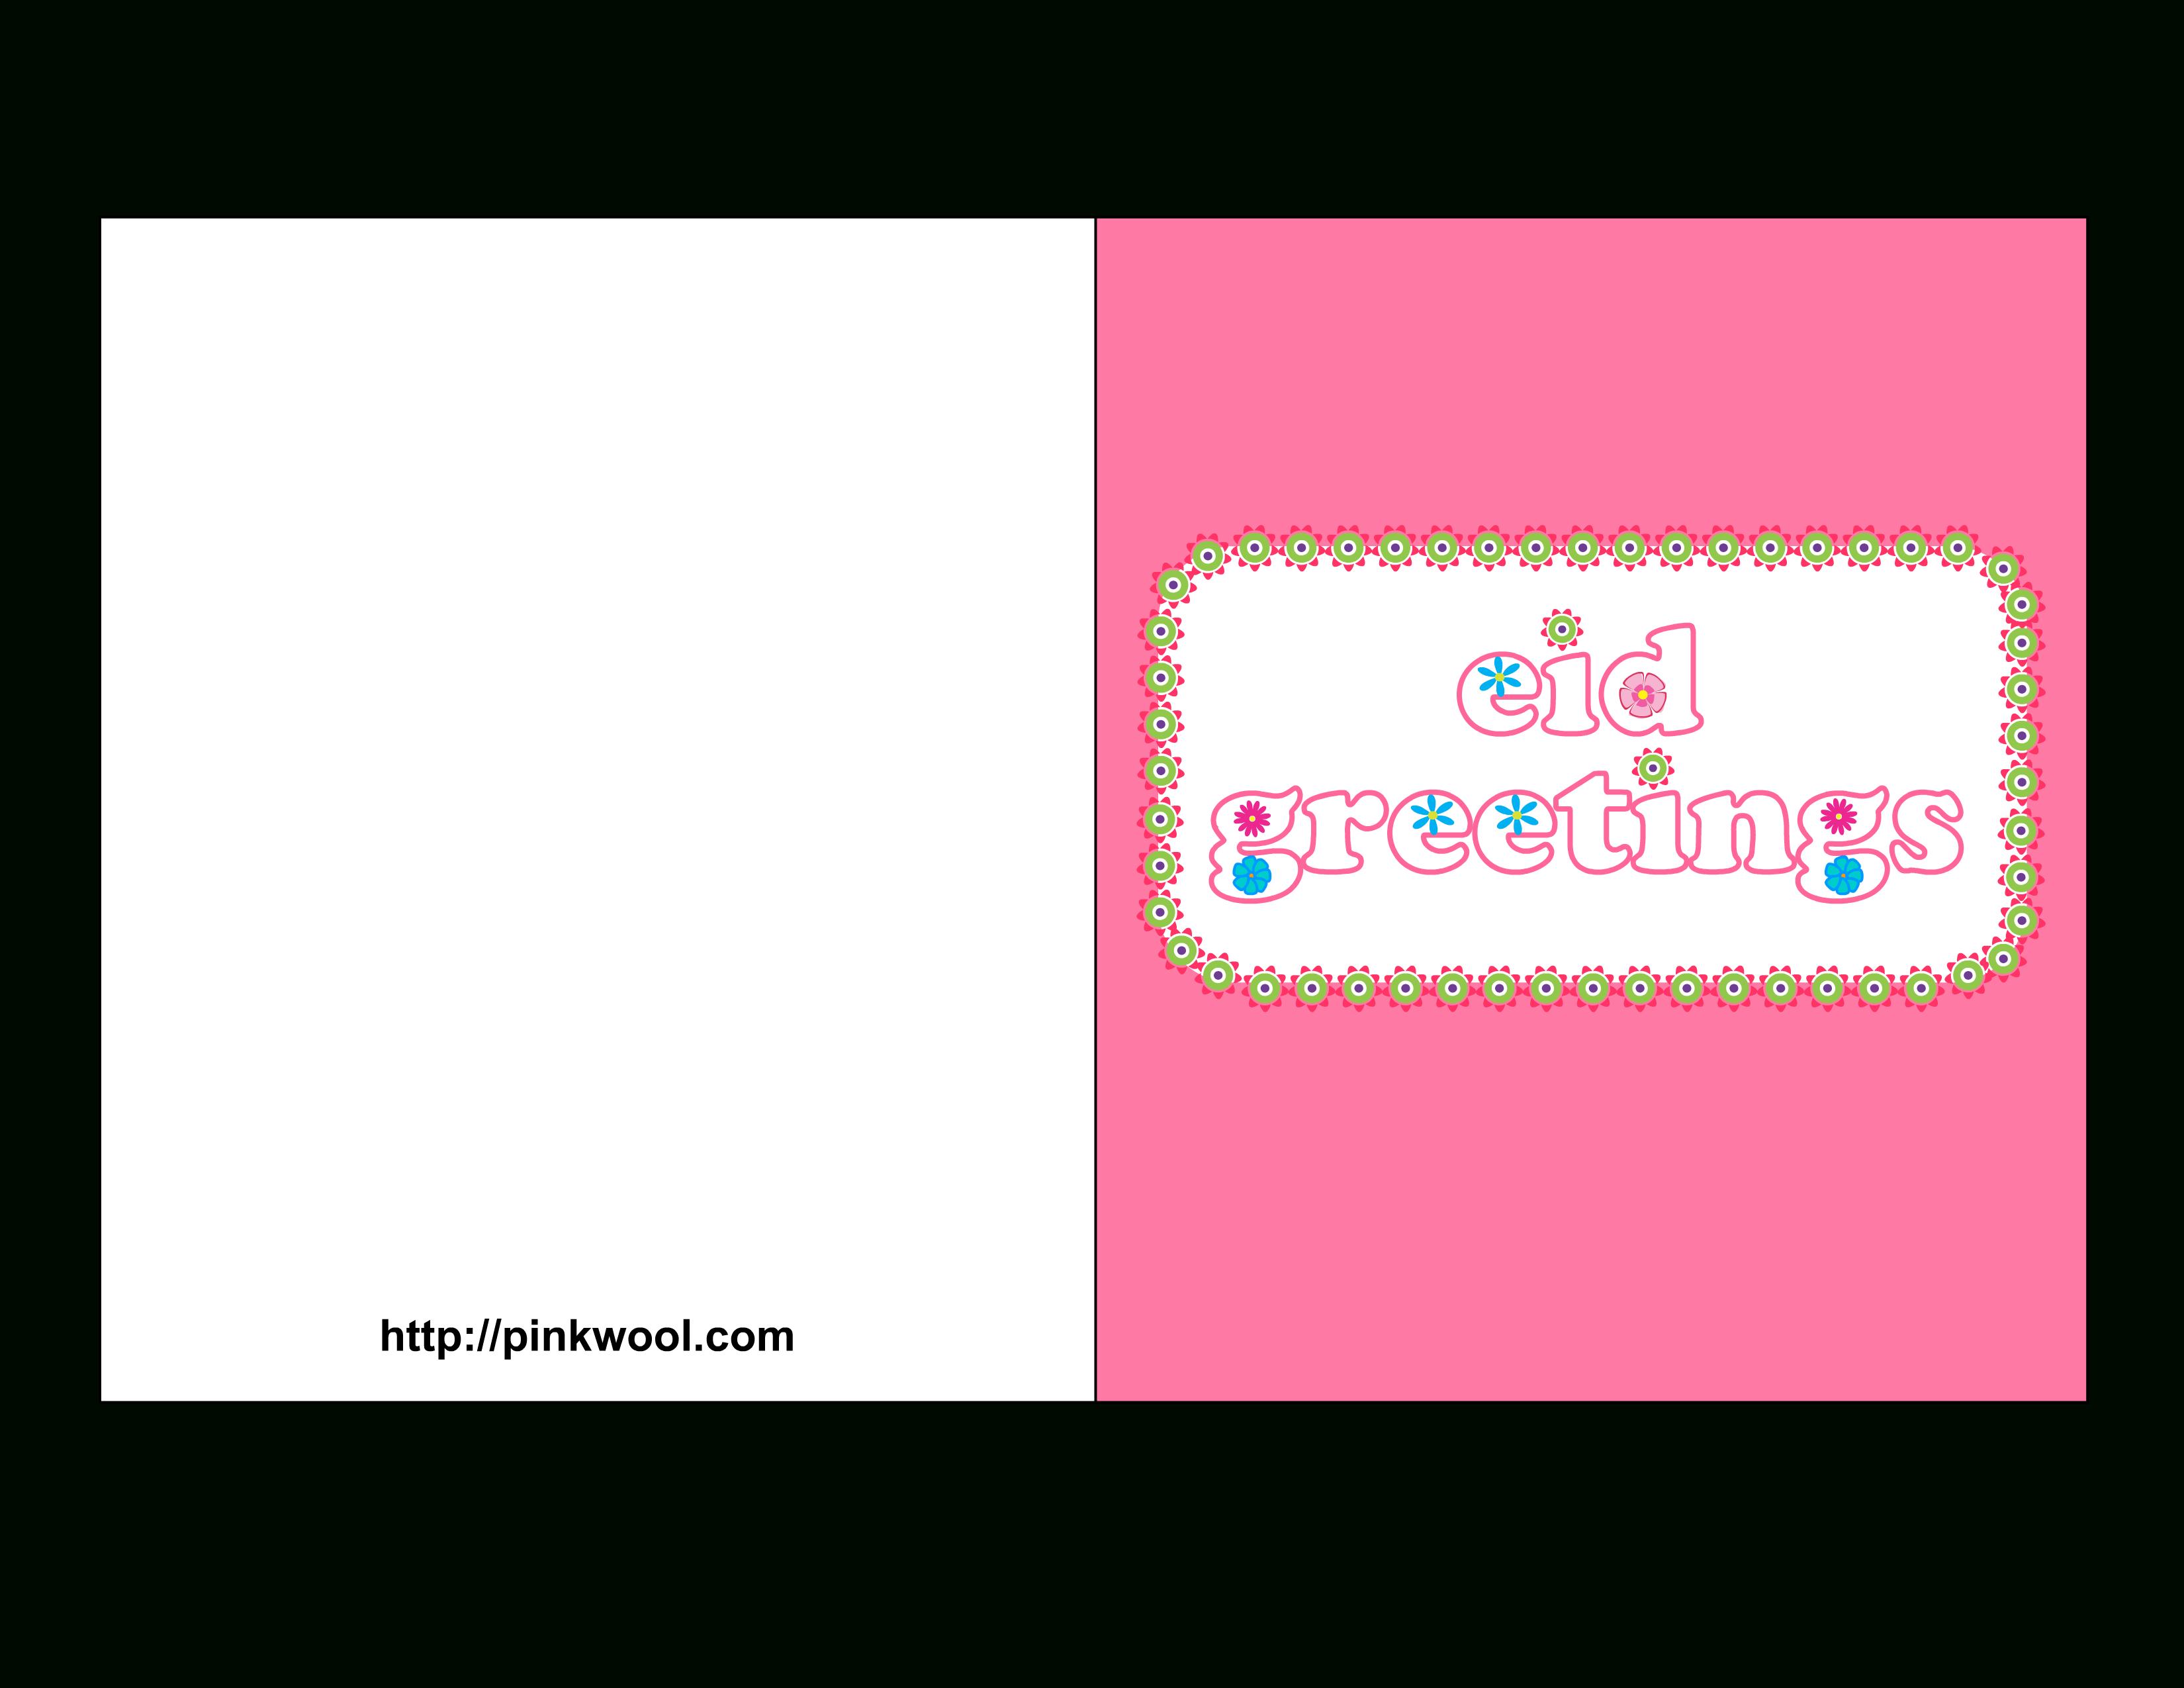 Free Printable Eid Greeting Cards - Eid Cards Free Printable